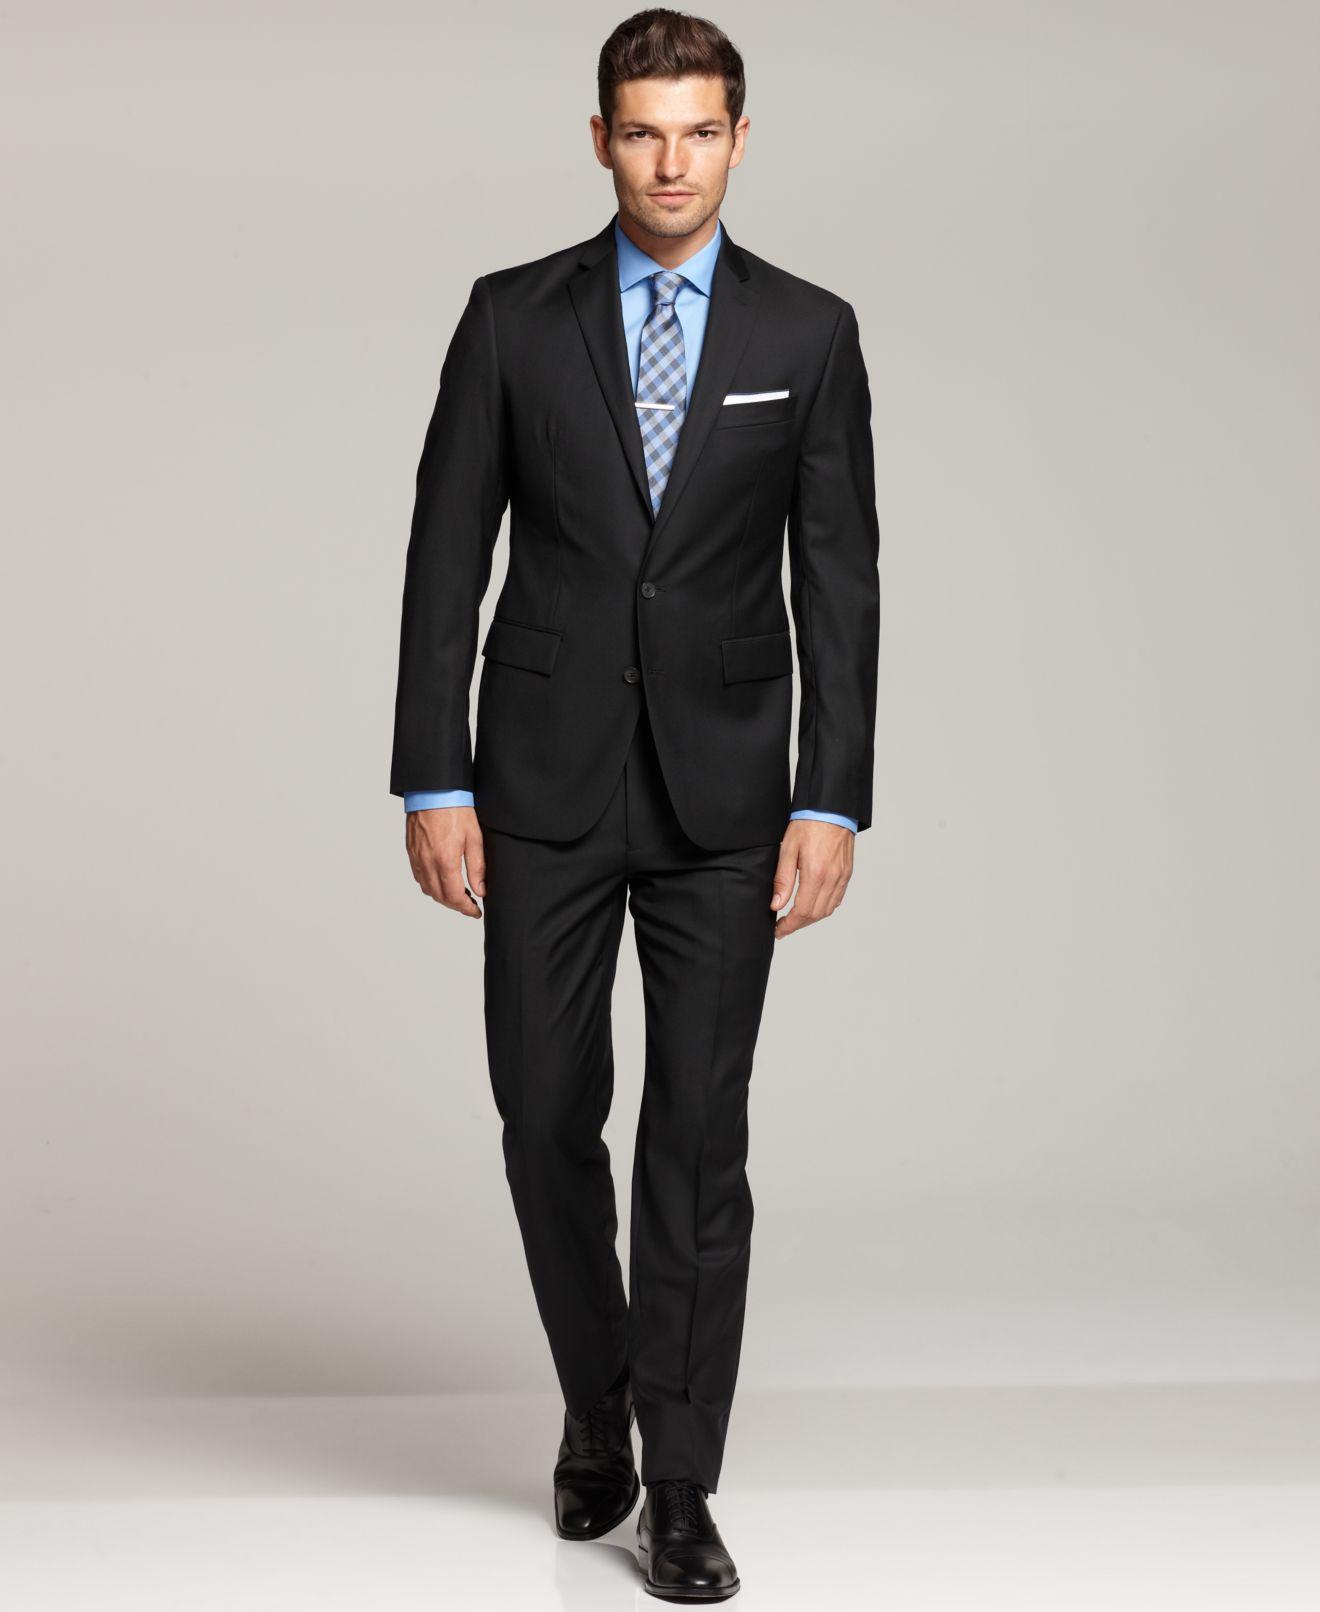 Ryan Seacrest Distinction Black Solid Modern Fit Suit Separates